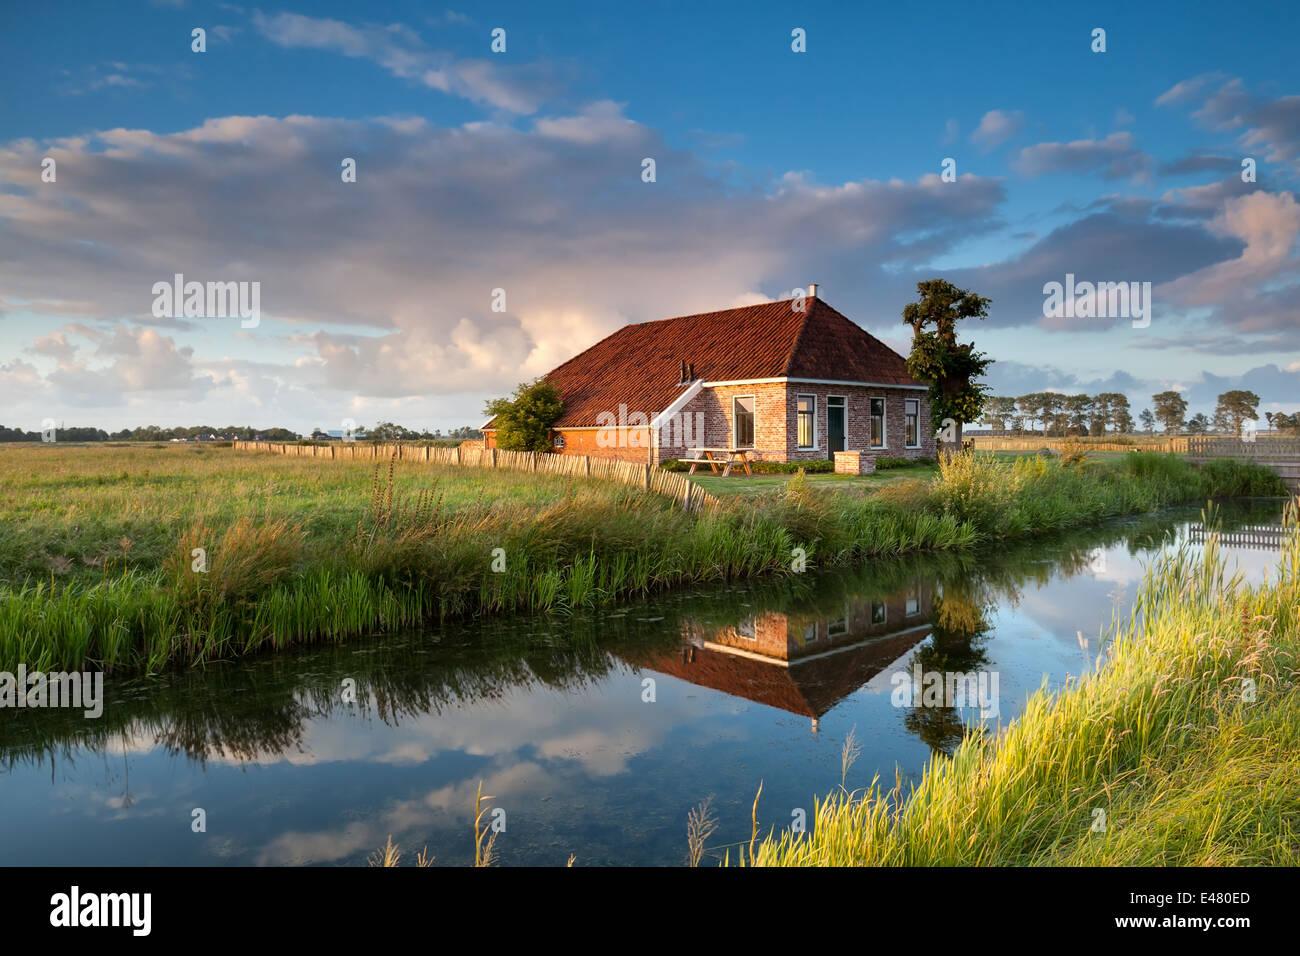 cozy farmhouse in gold sunset sunlight, Netherlands, - Stock Image